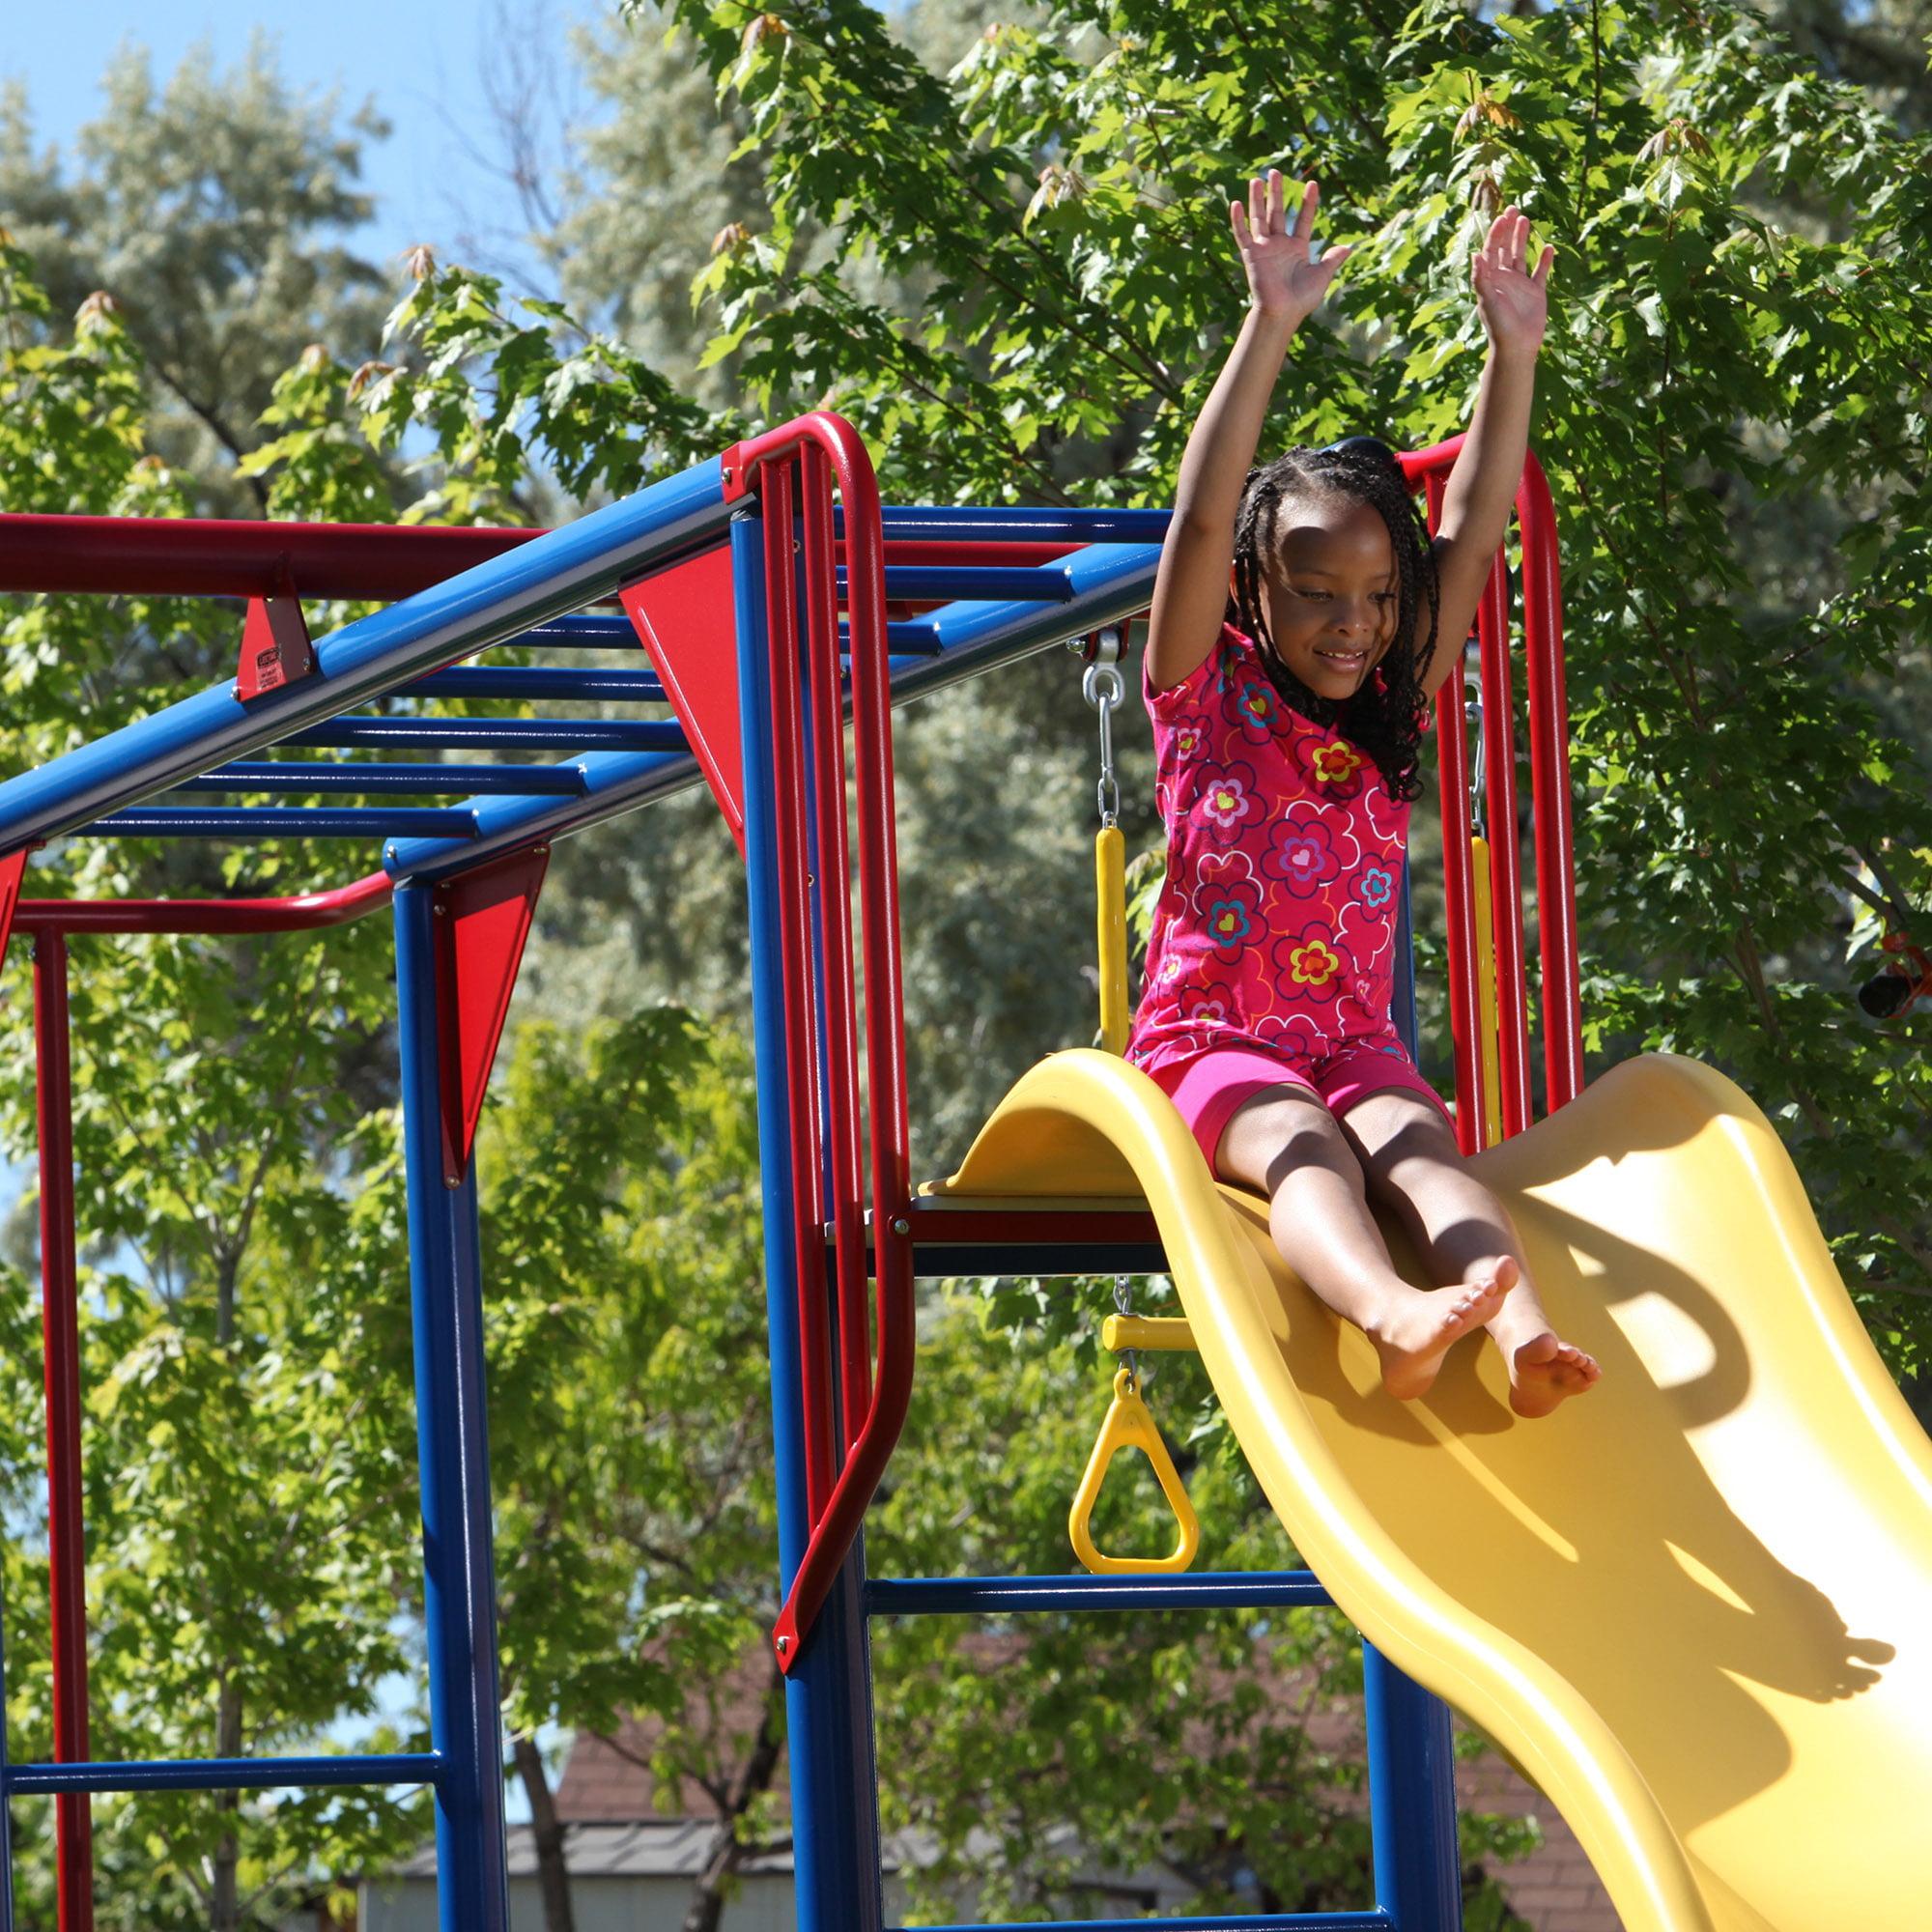 playset the lifetimemoorsetown moorestown pros assembly blog set swing nj lifetime